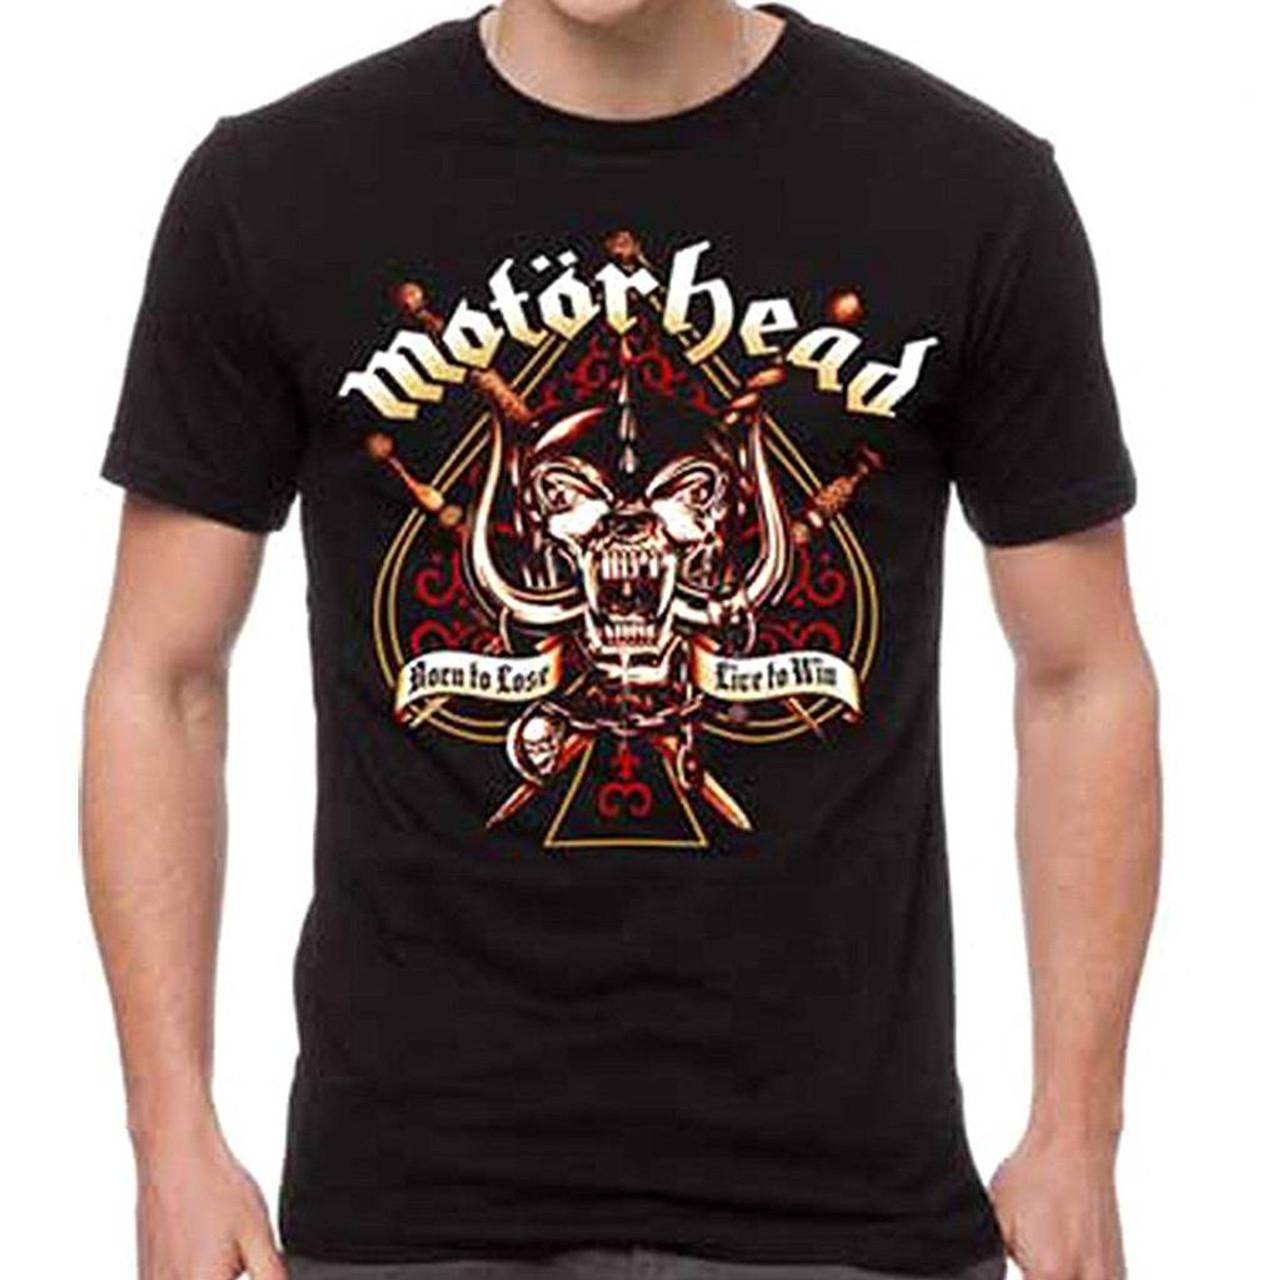 Motorhead Unisex Sword Spade Clean T-Shirt